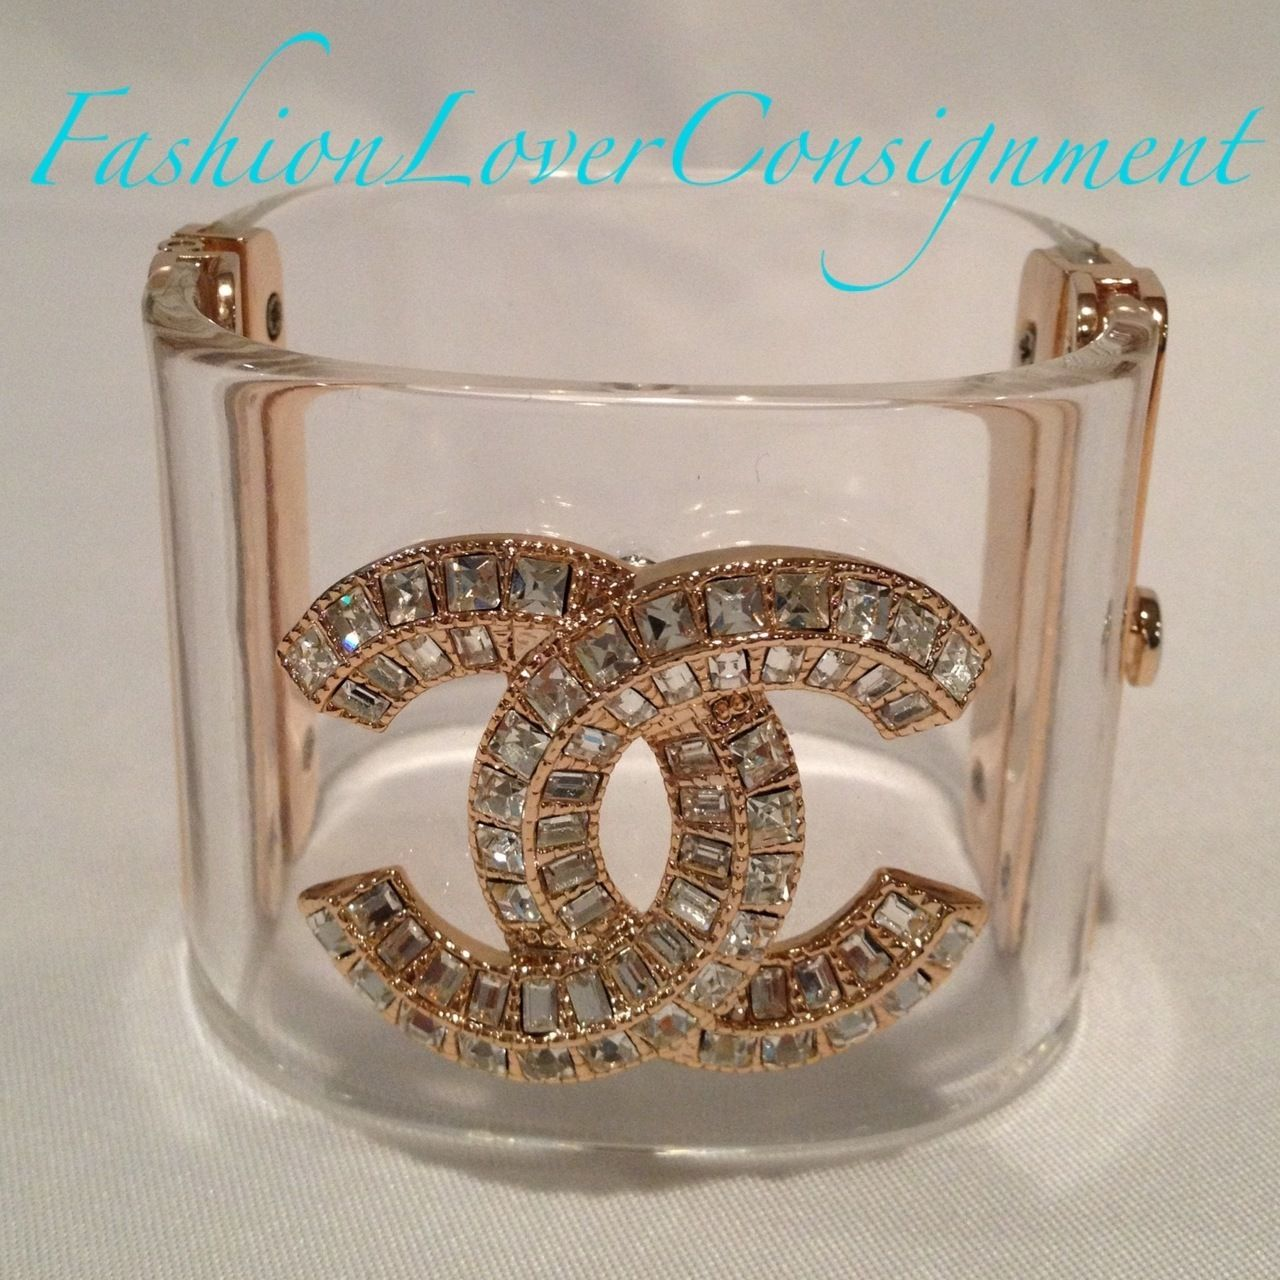 Chanel fashion jewelry sale 49